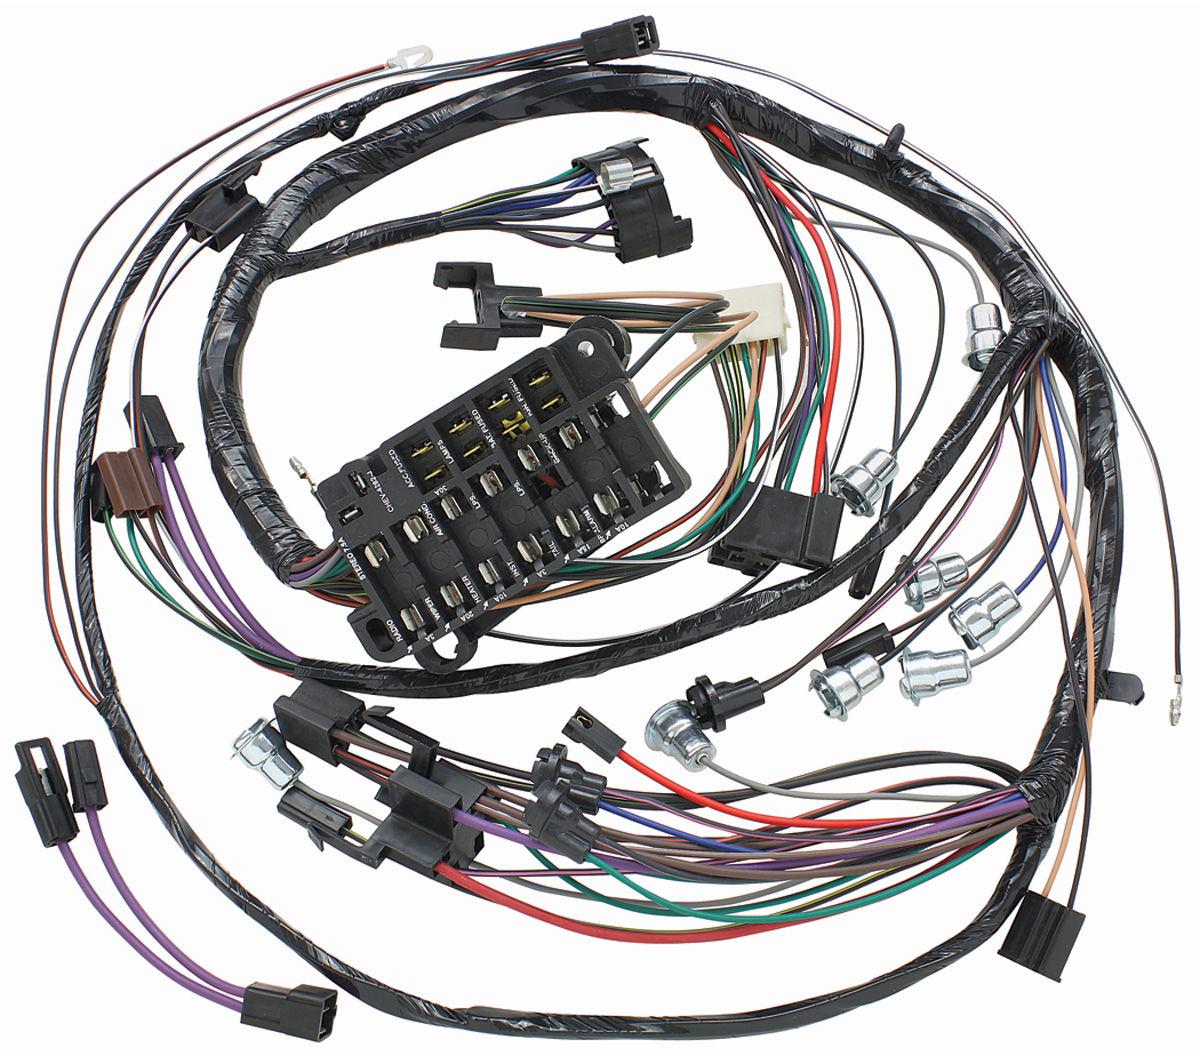 67 chevelle dash fuse box wiring library dodge charger fuse box 67 chevelle dash fuse box [ 1200 x 1056 Pixel ]